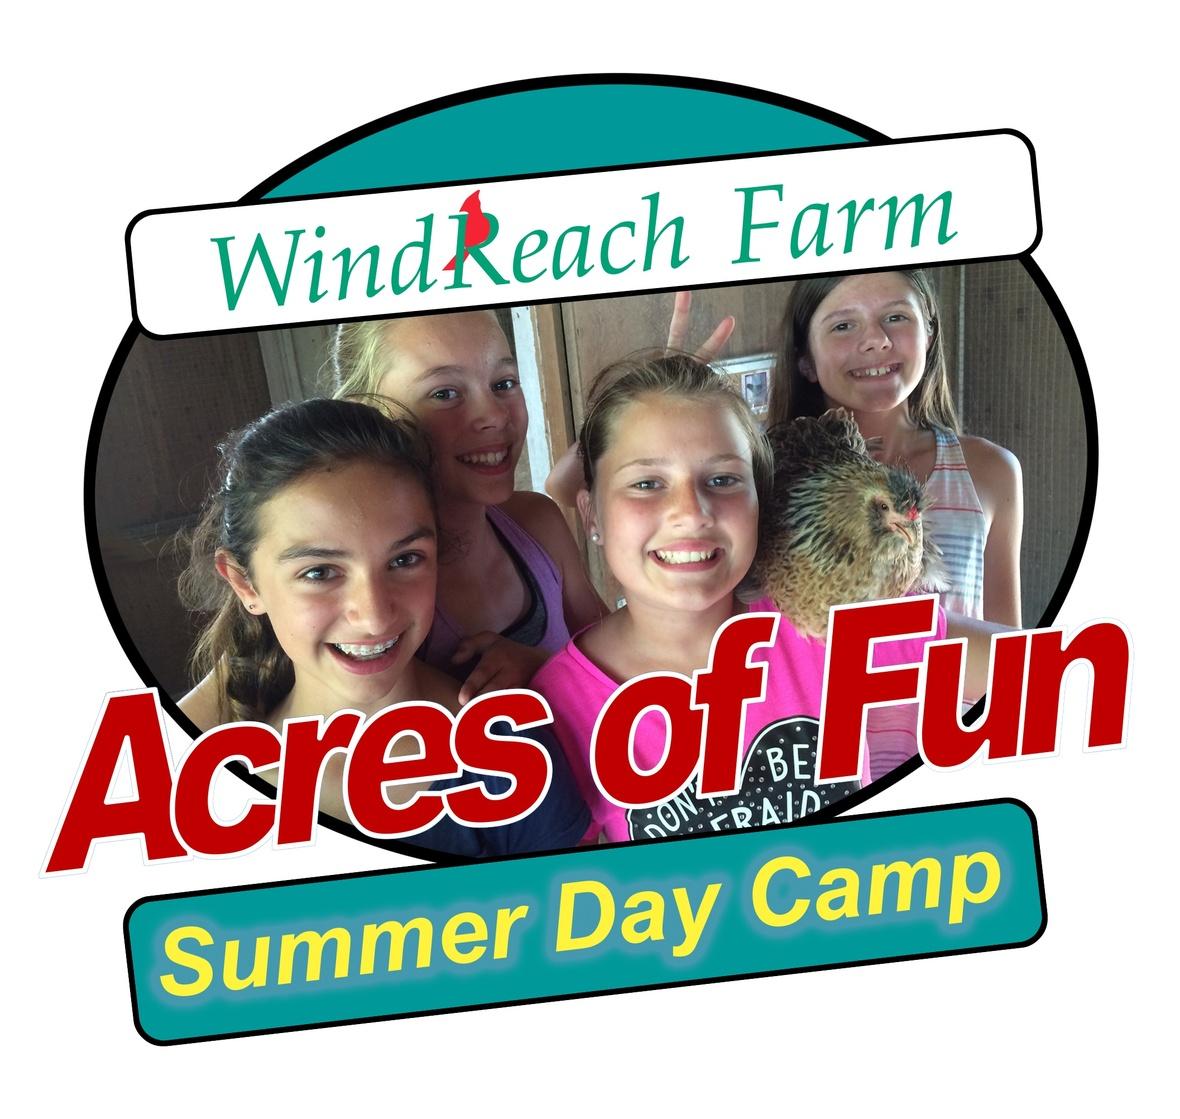 WindreachSummer Camp logo